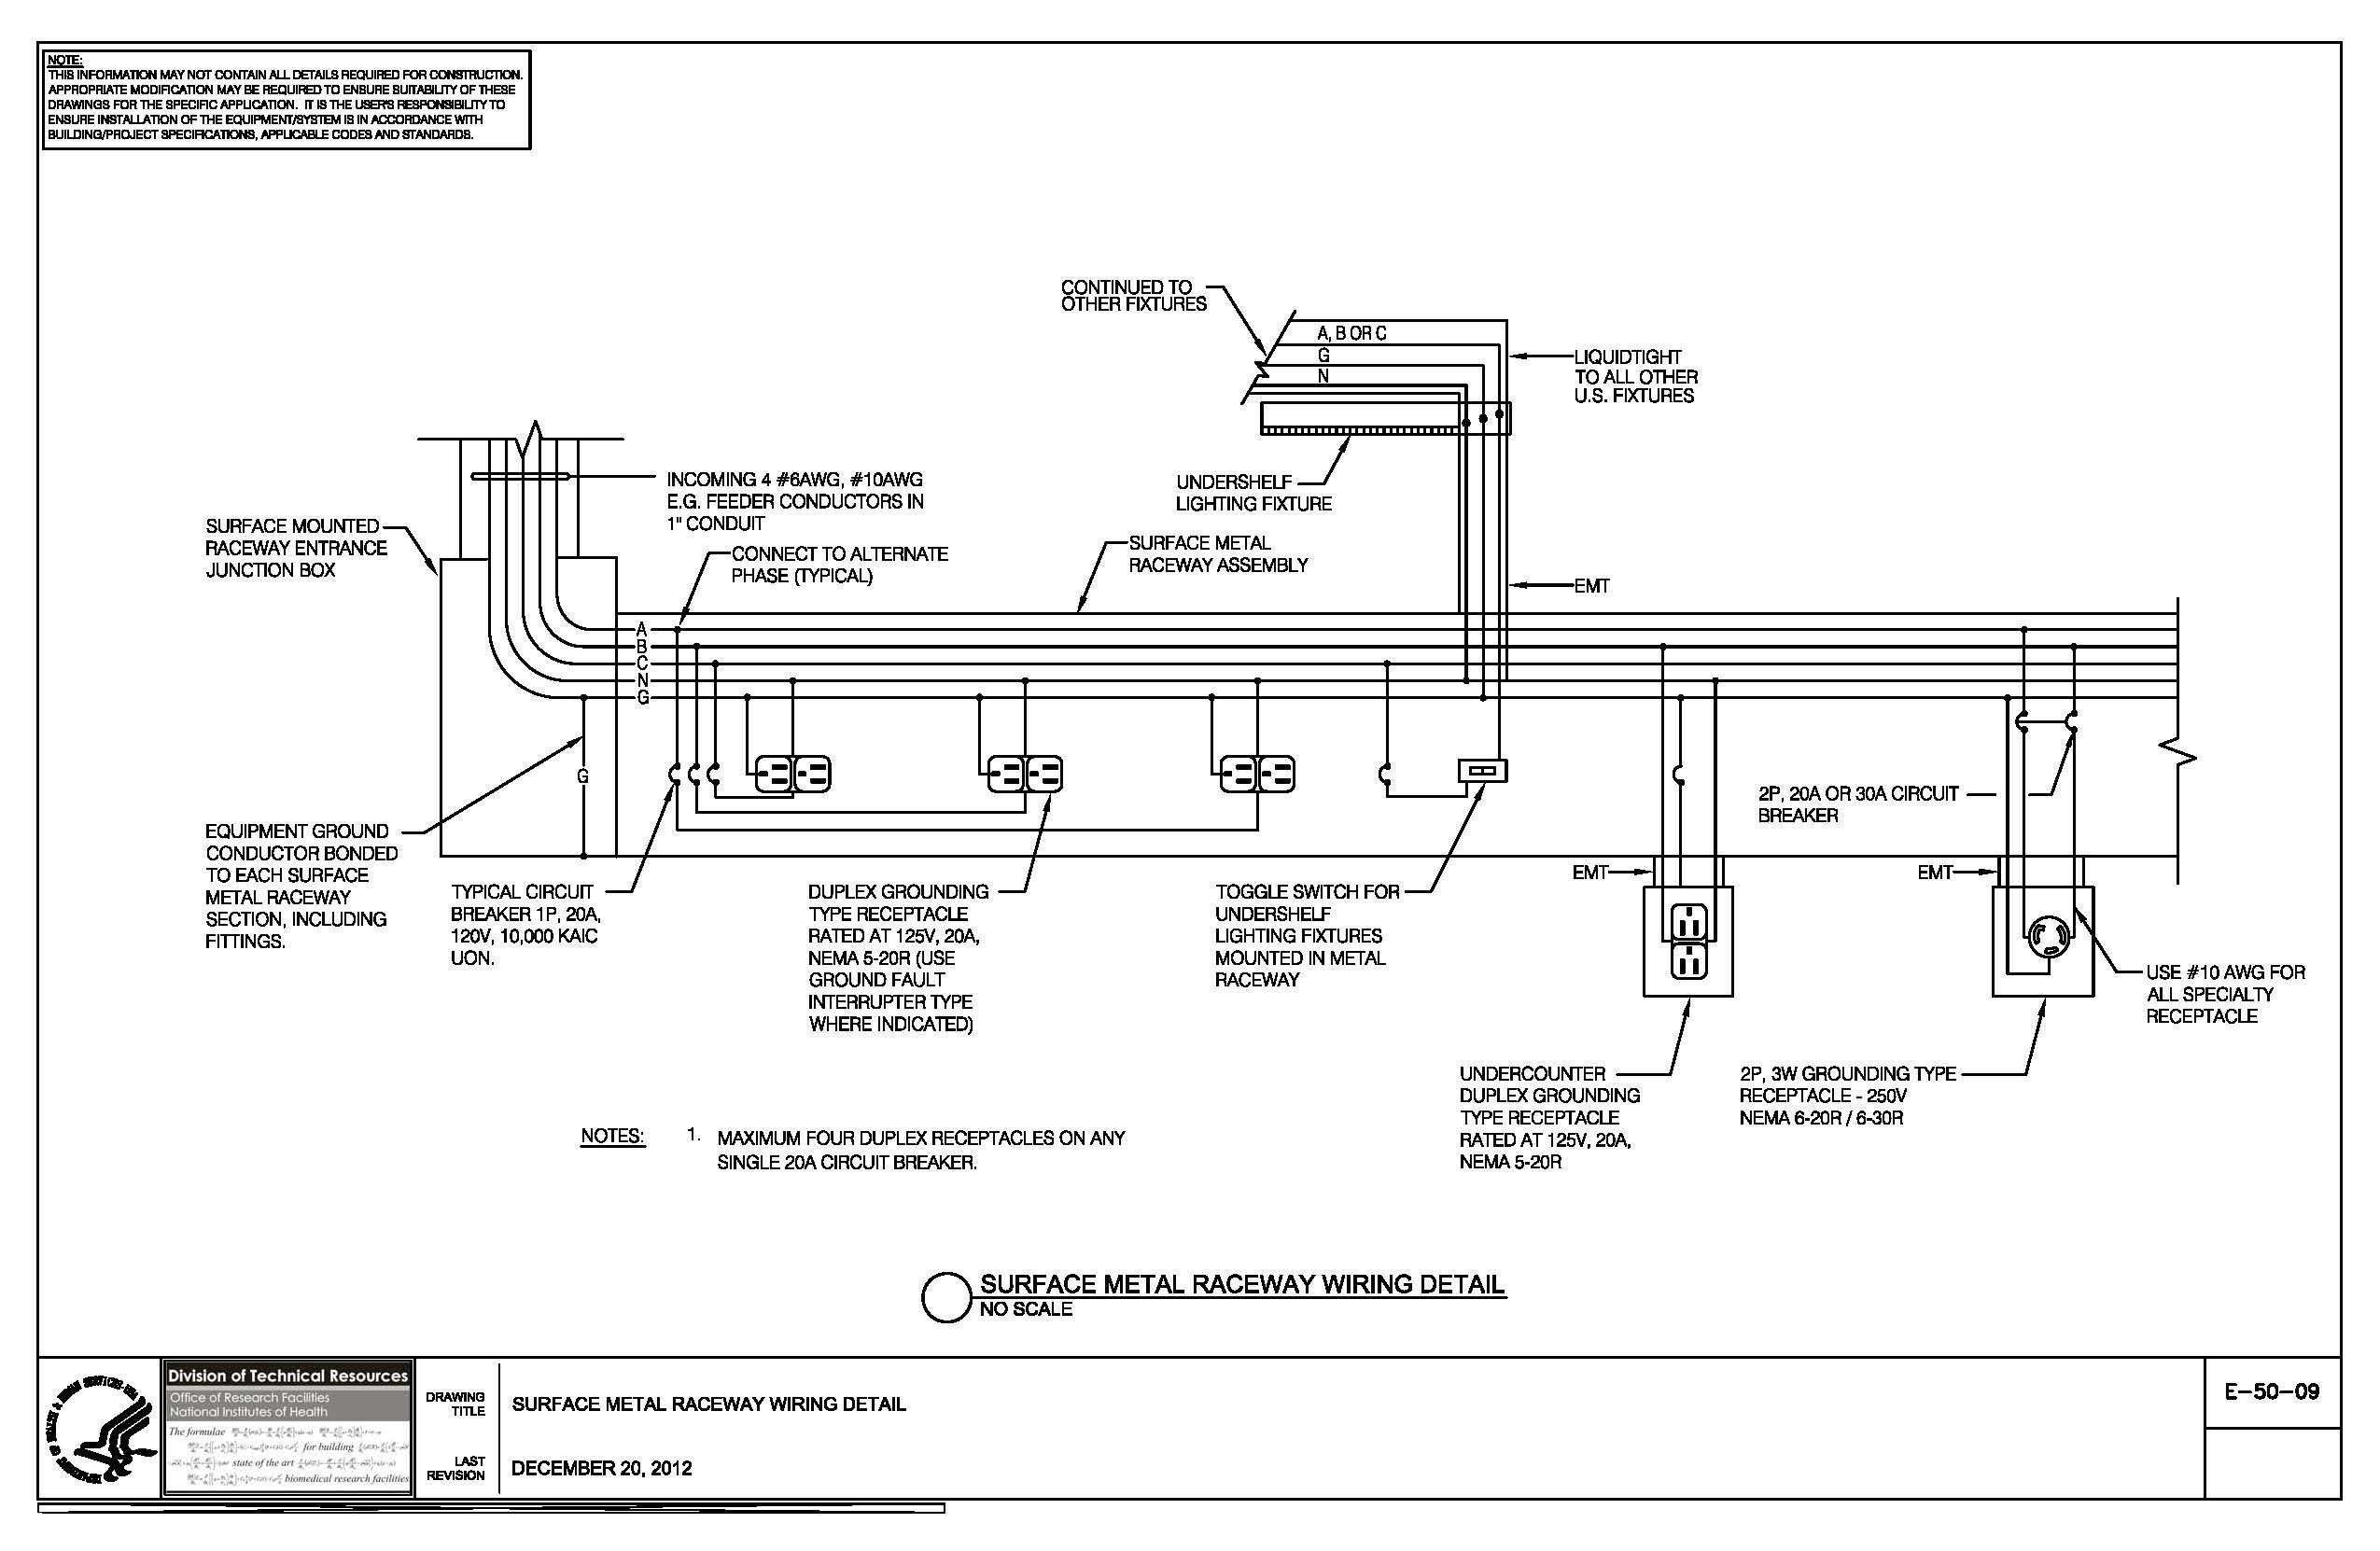 Electric Circuit Diagram New Surface Wiring Diagram Wiring Diagrams